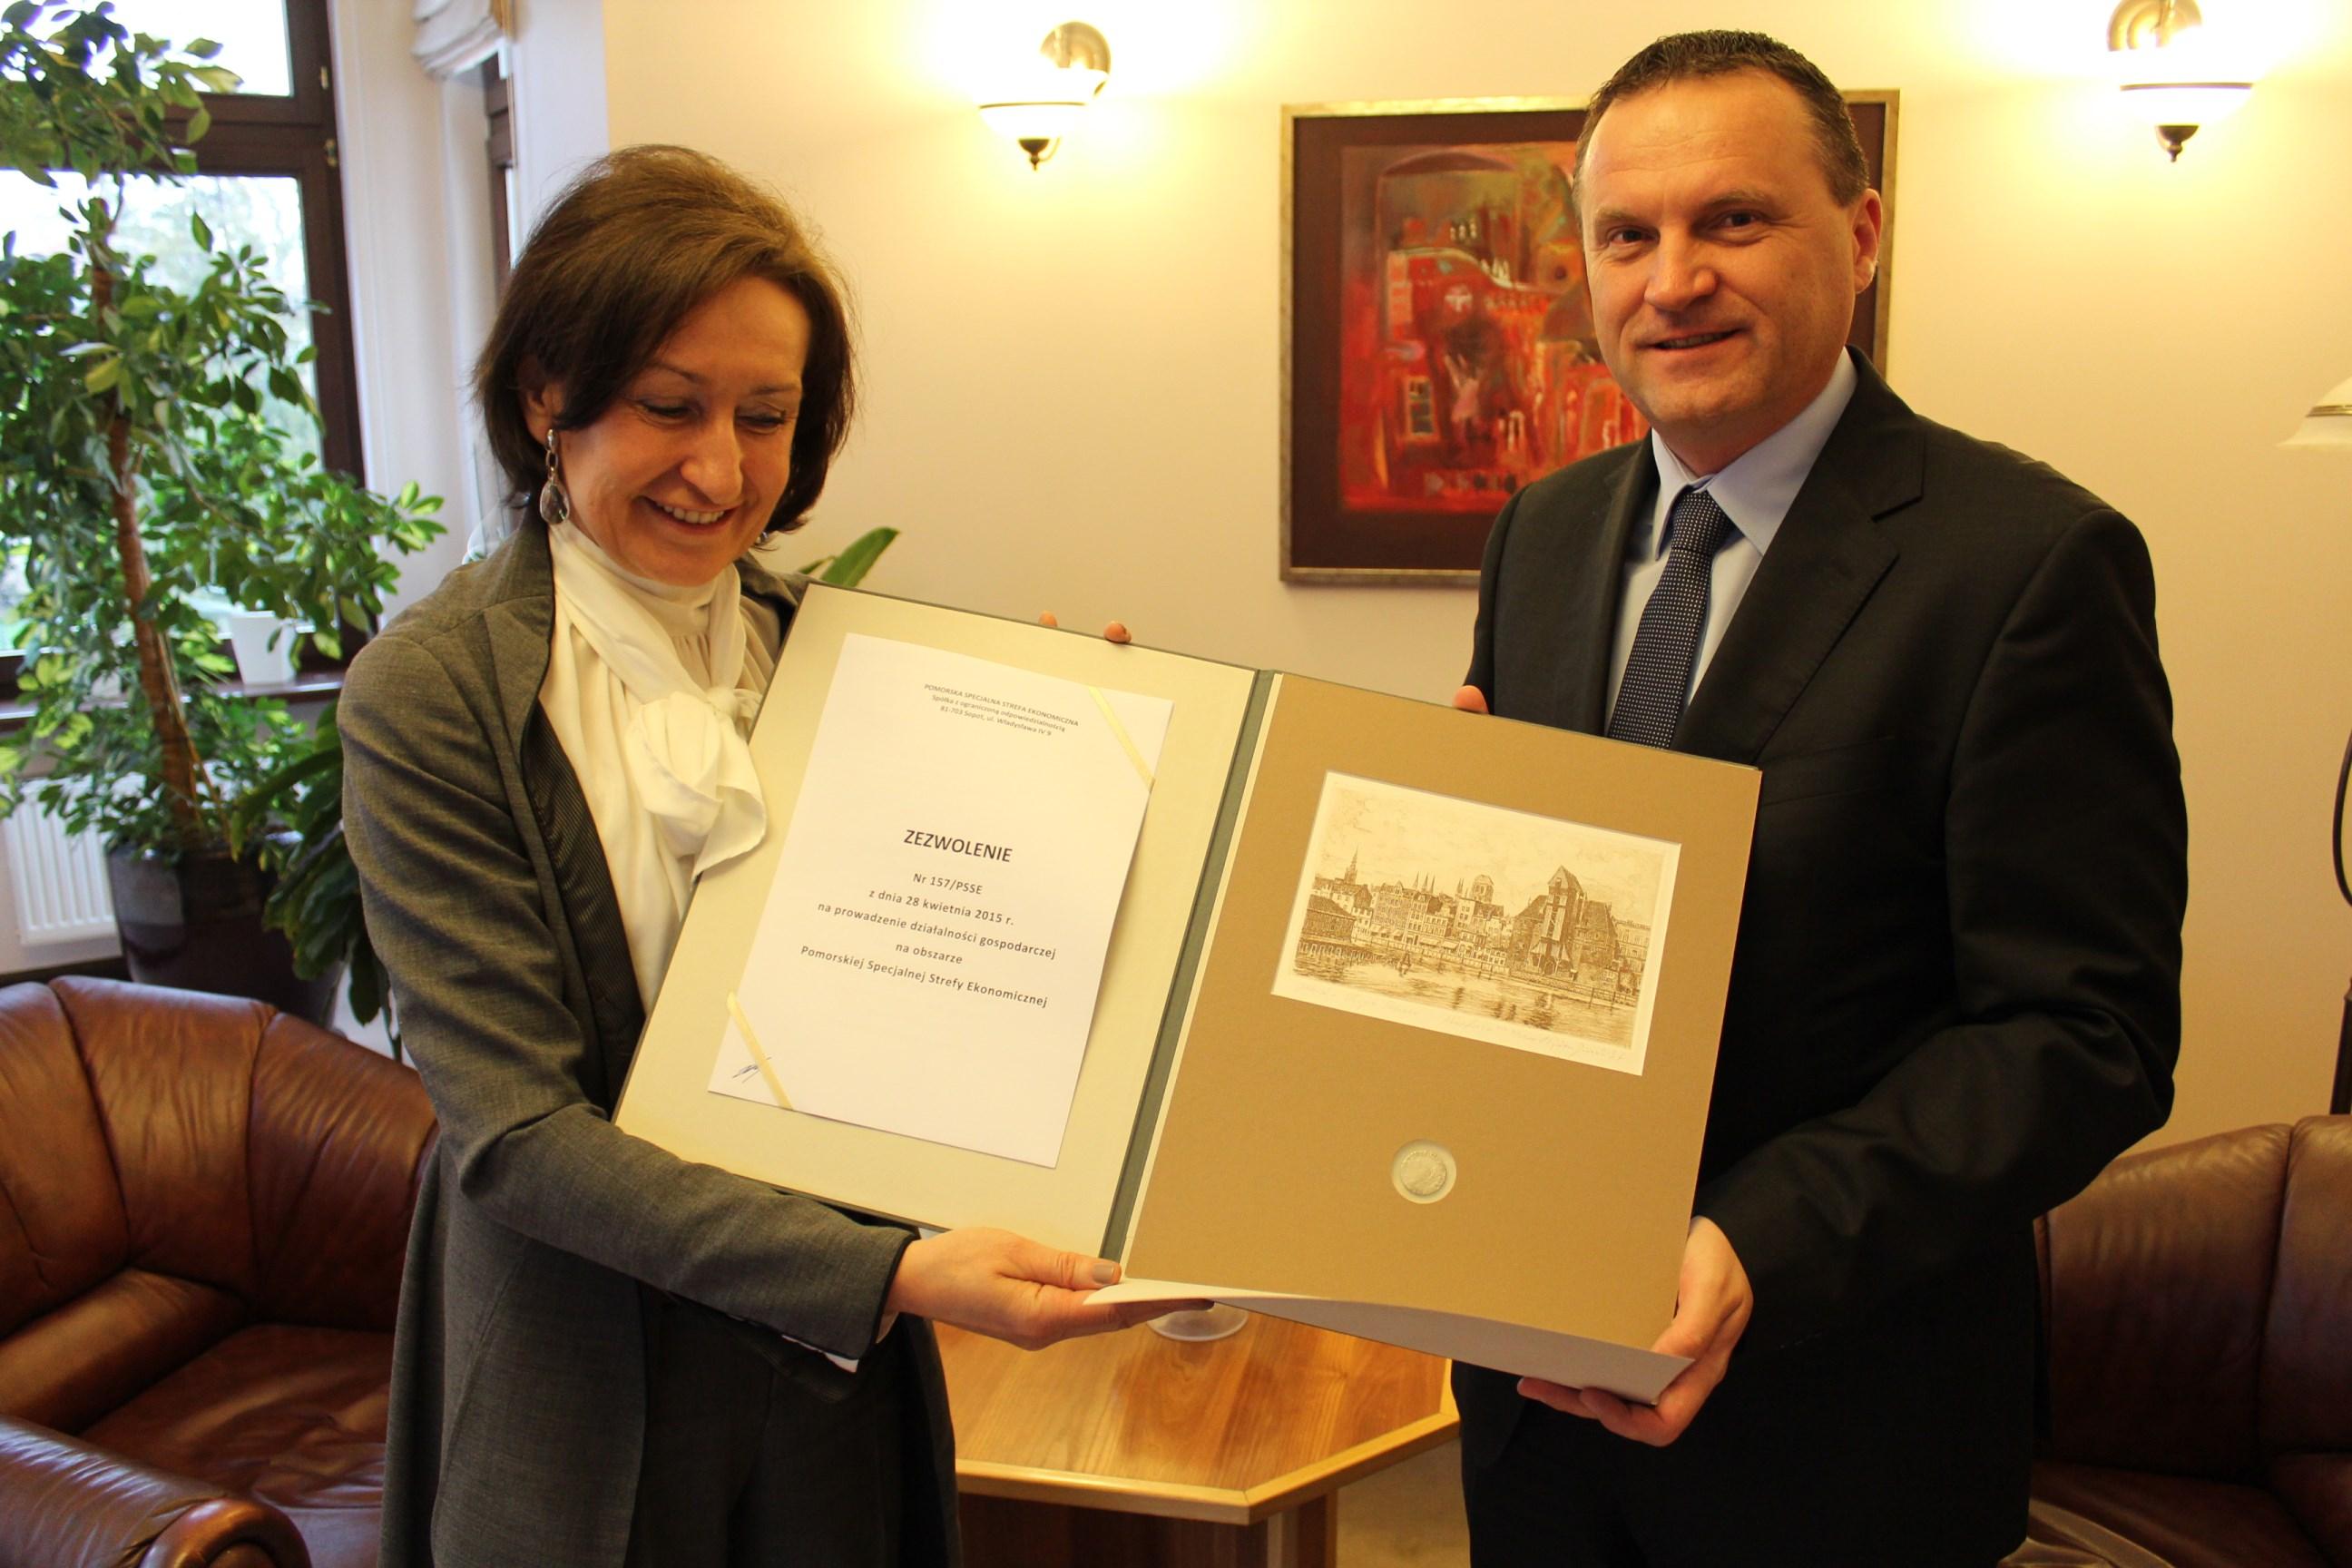 Teresa Kamińska, presidenta de Management Board Pomeranian Special Economic Zone y Witold Majgier, jefe de la planta de SP GROUP Polonia.